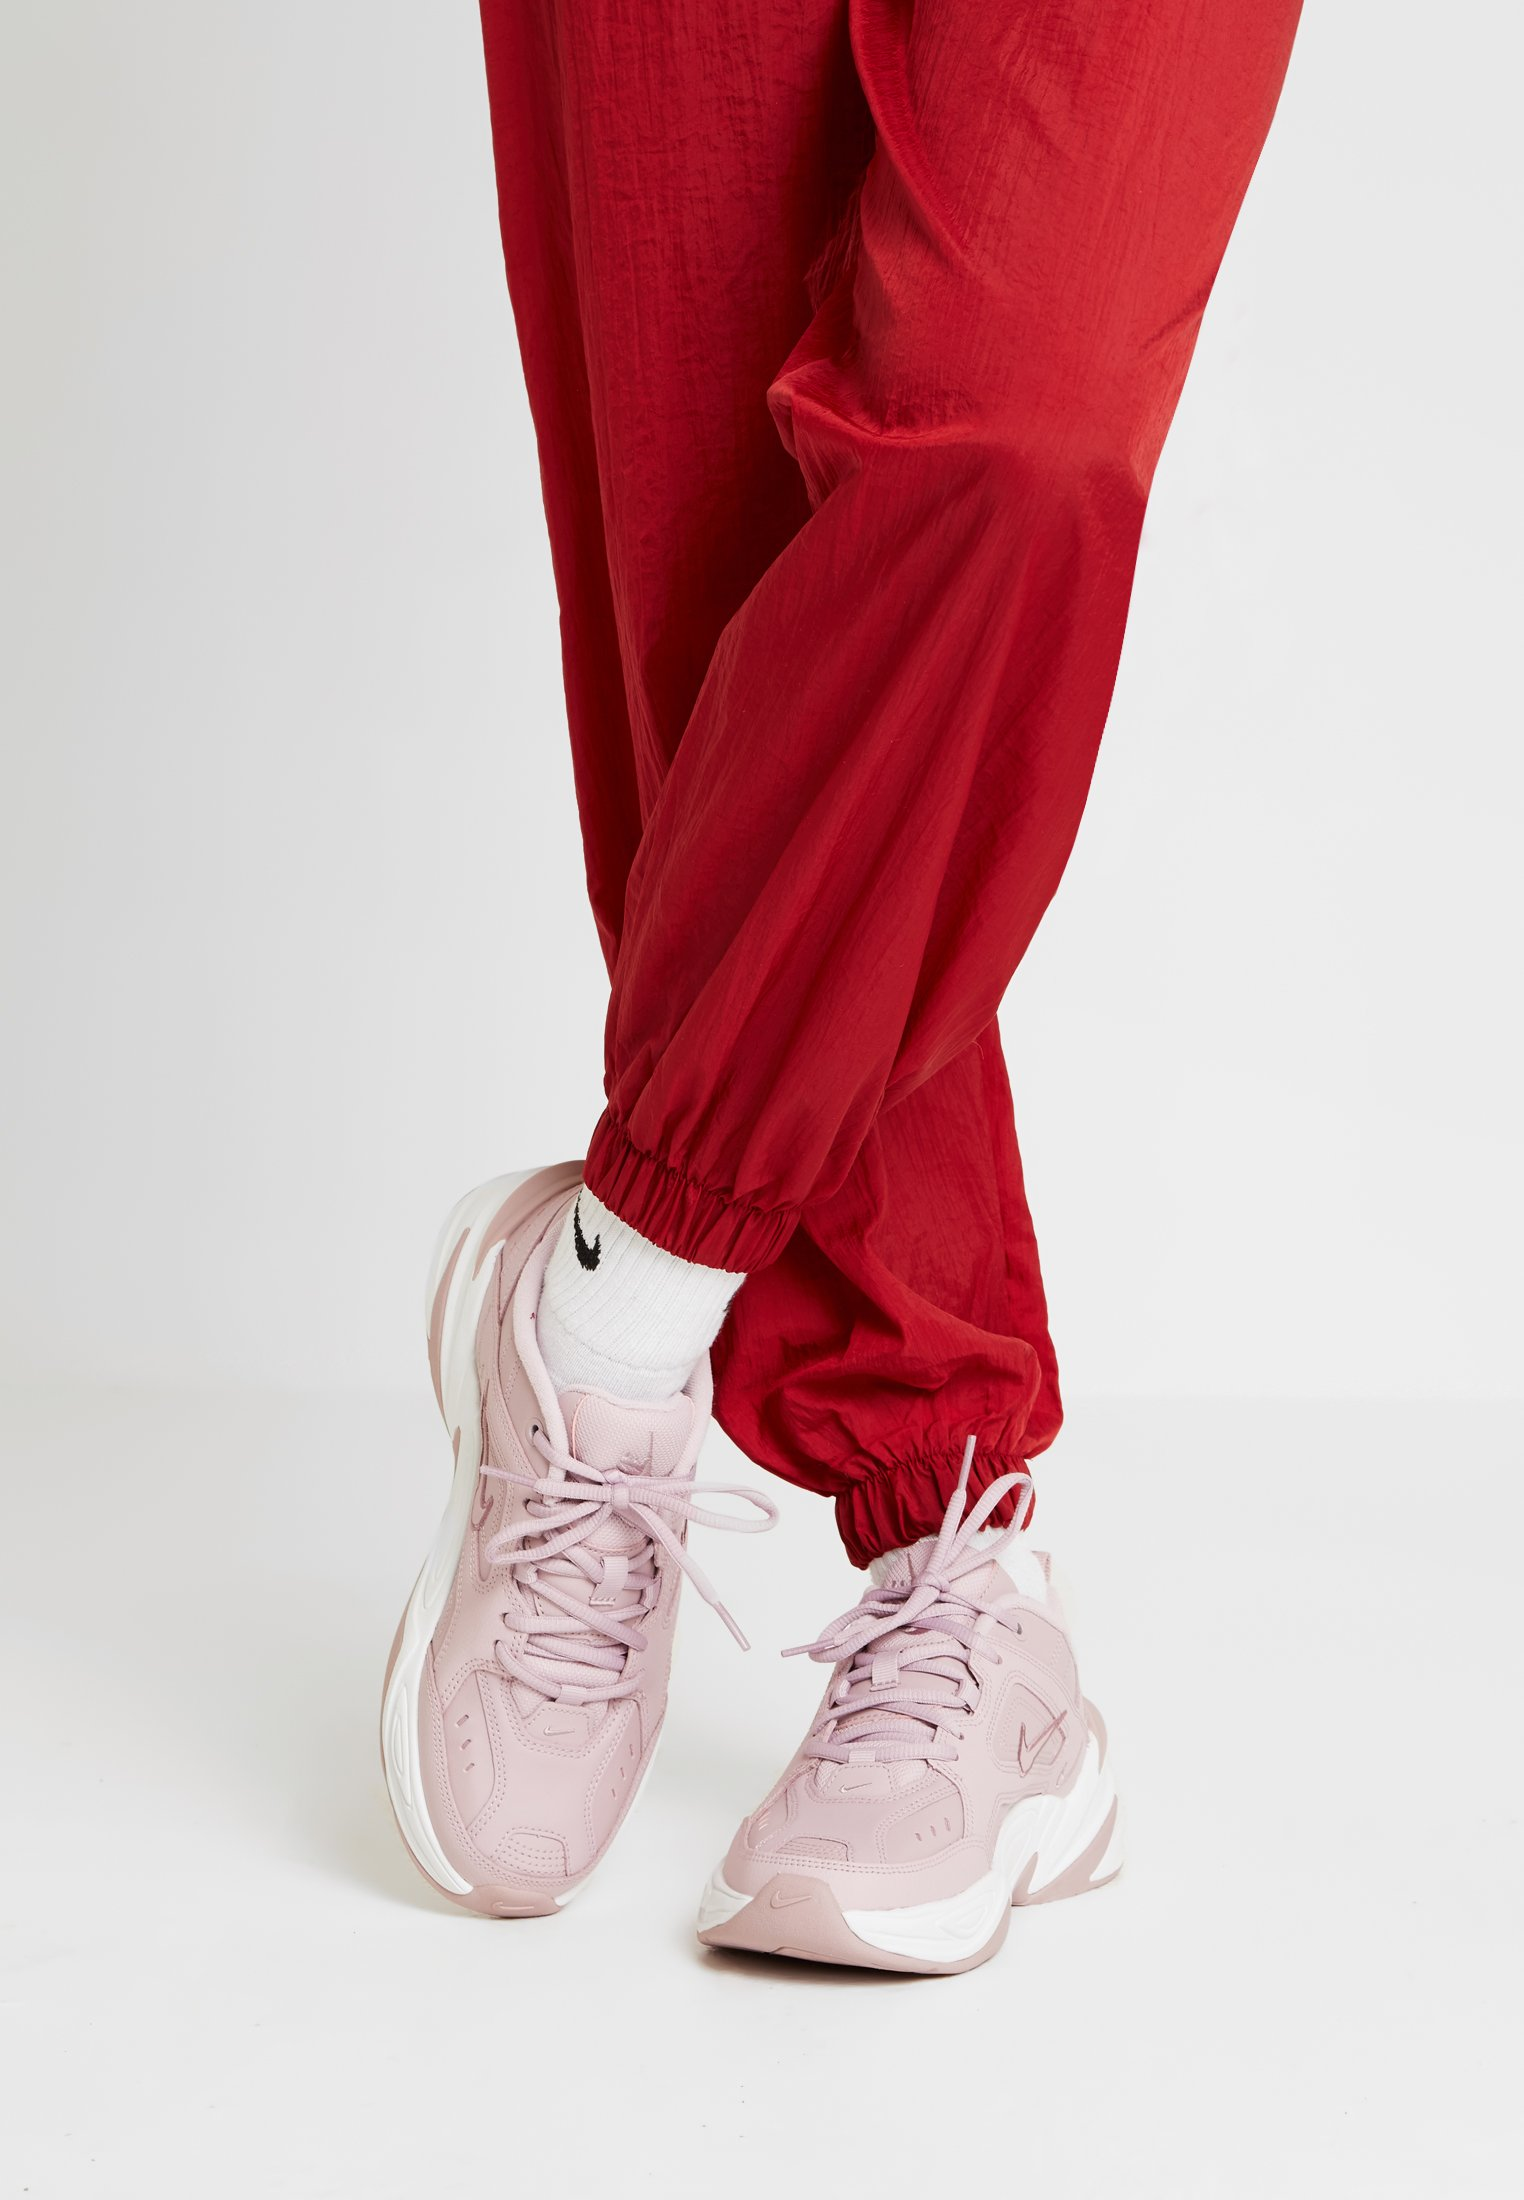 White TeknoBaskets Plum Sportswear Basses Chalk M2k Dust Nike summit plum XkuPZTwOi